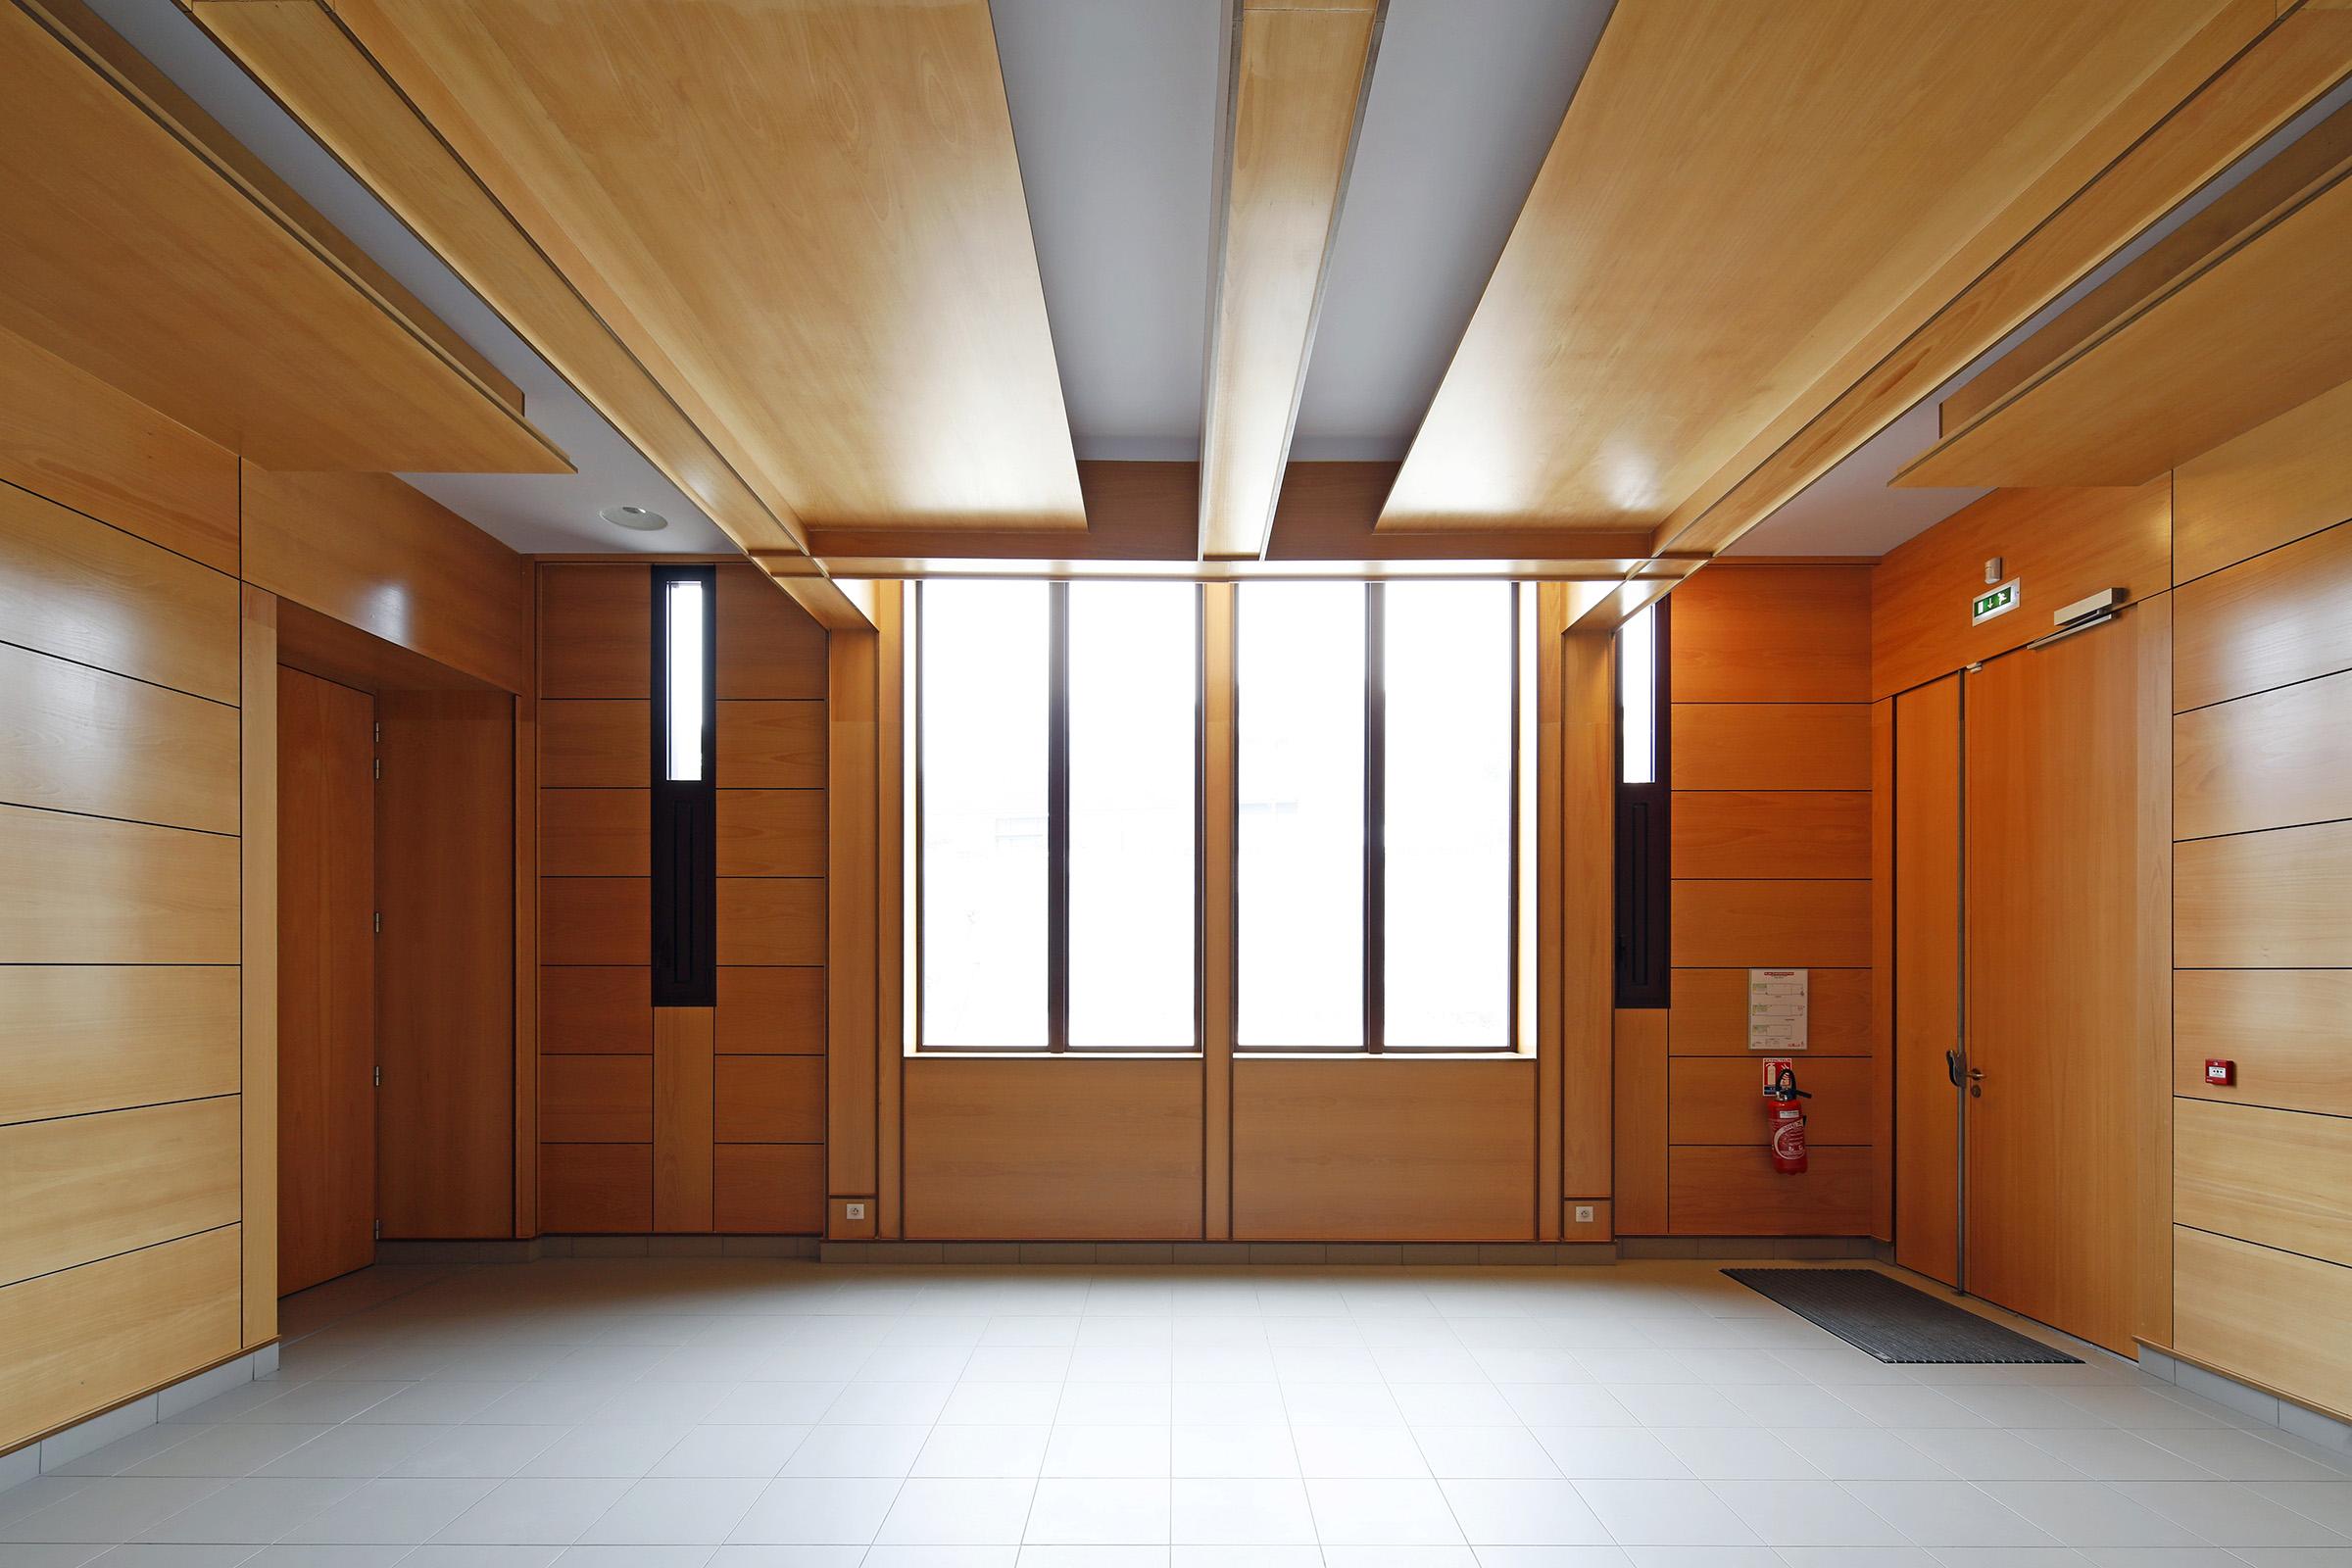 Amilly - La Maison Saint Loup - Interieur - Sylvain Dubuisson 055.jpg